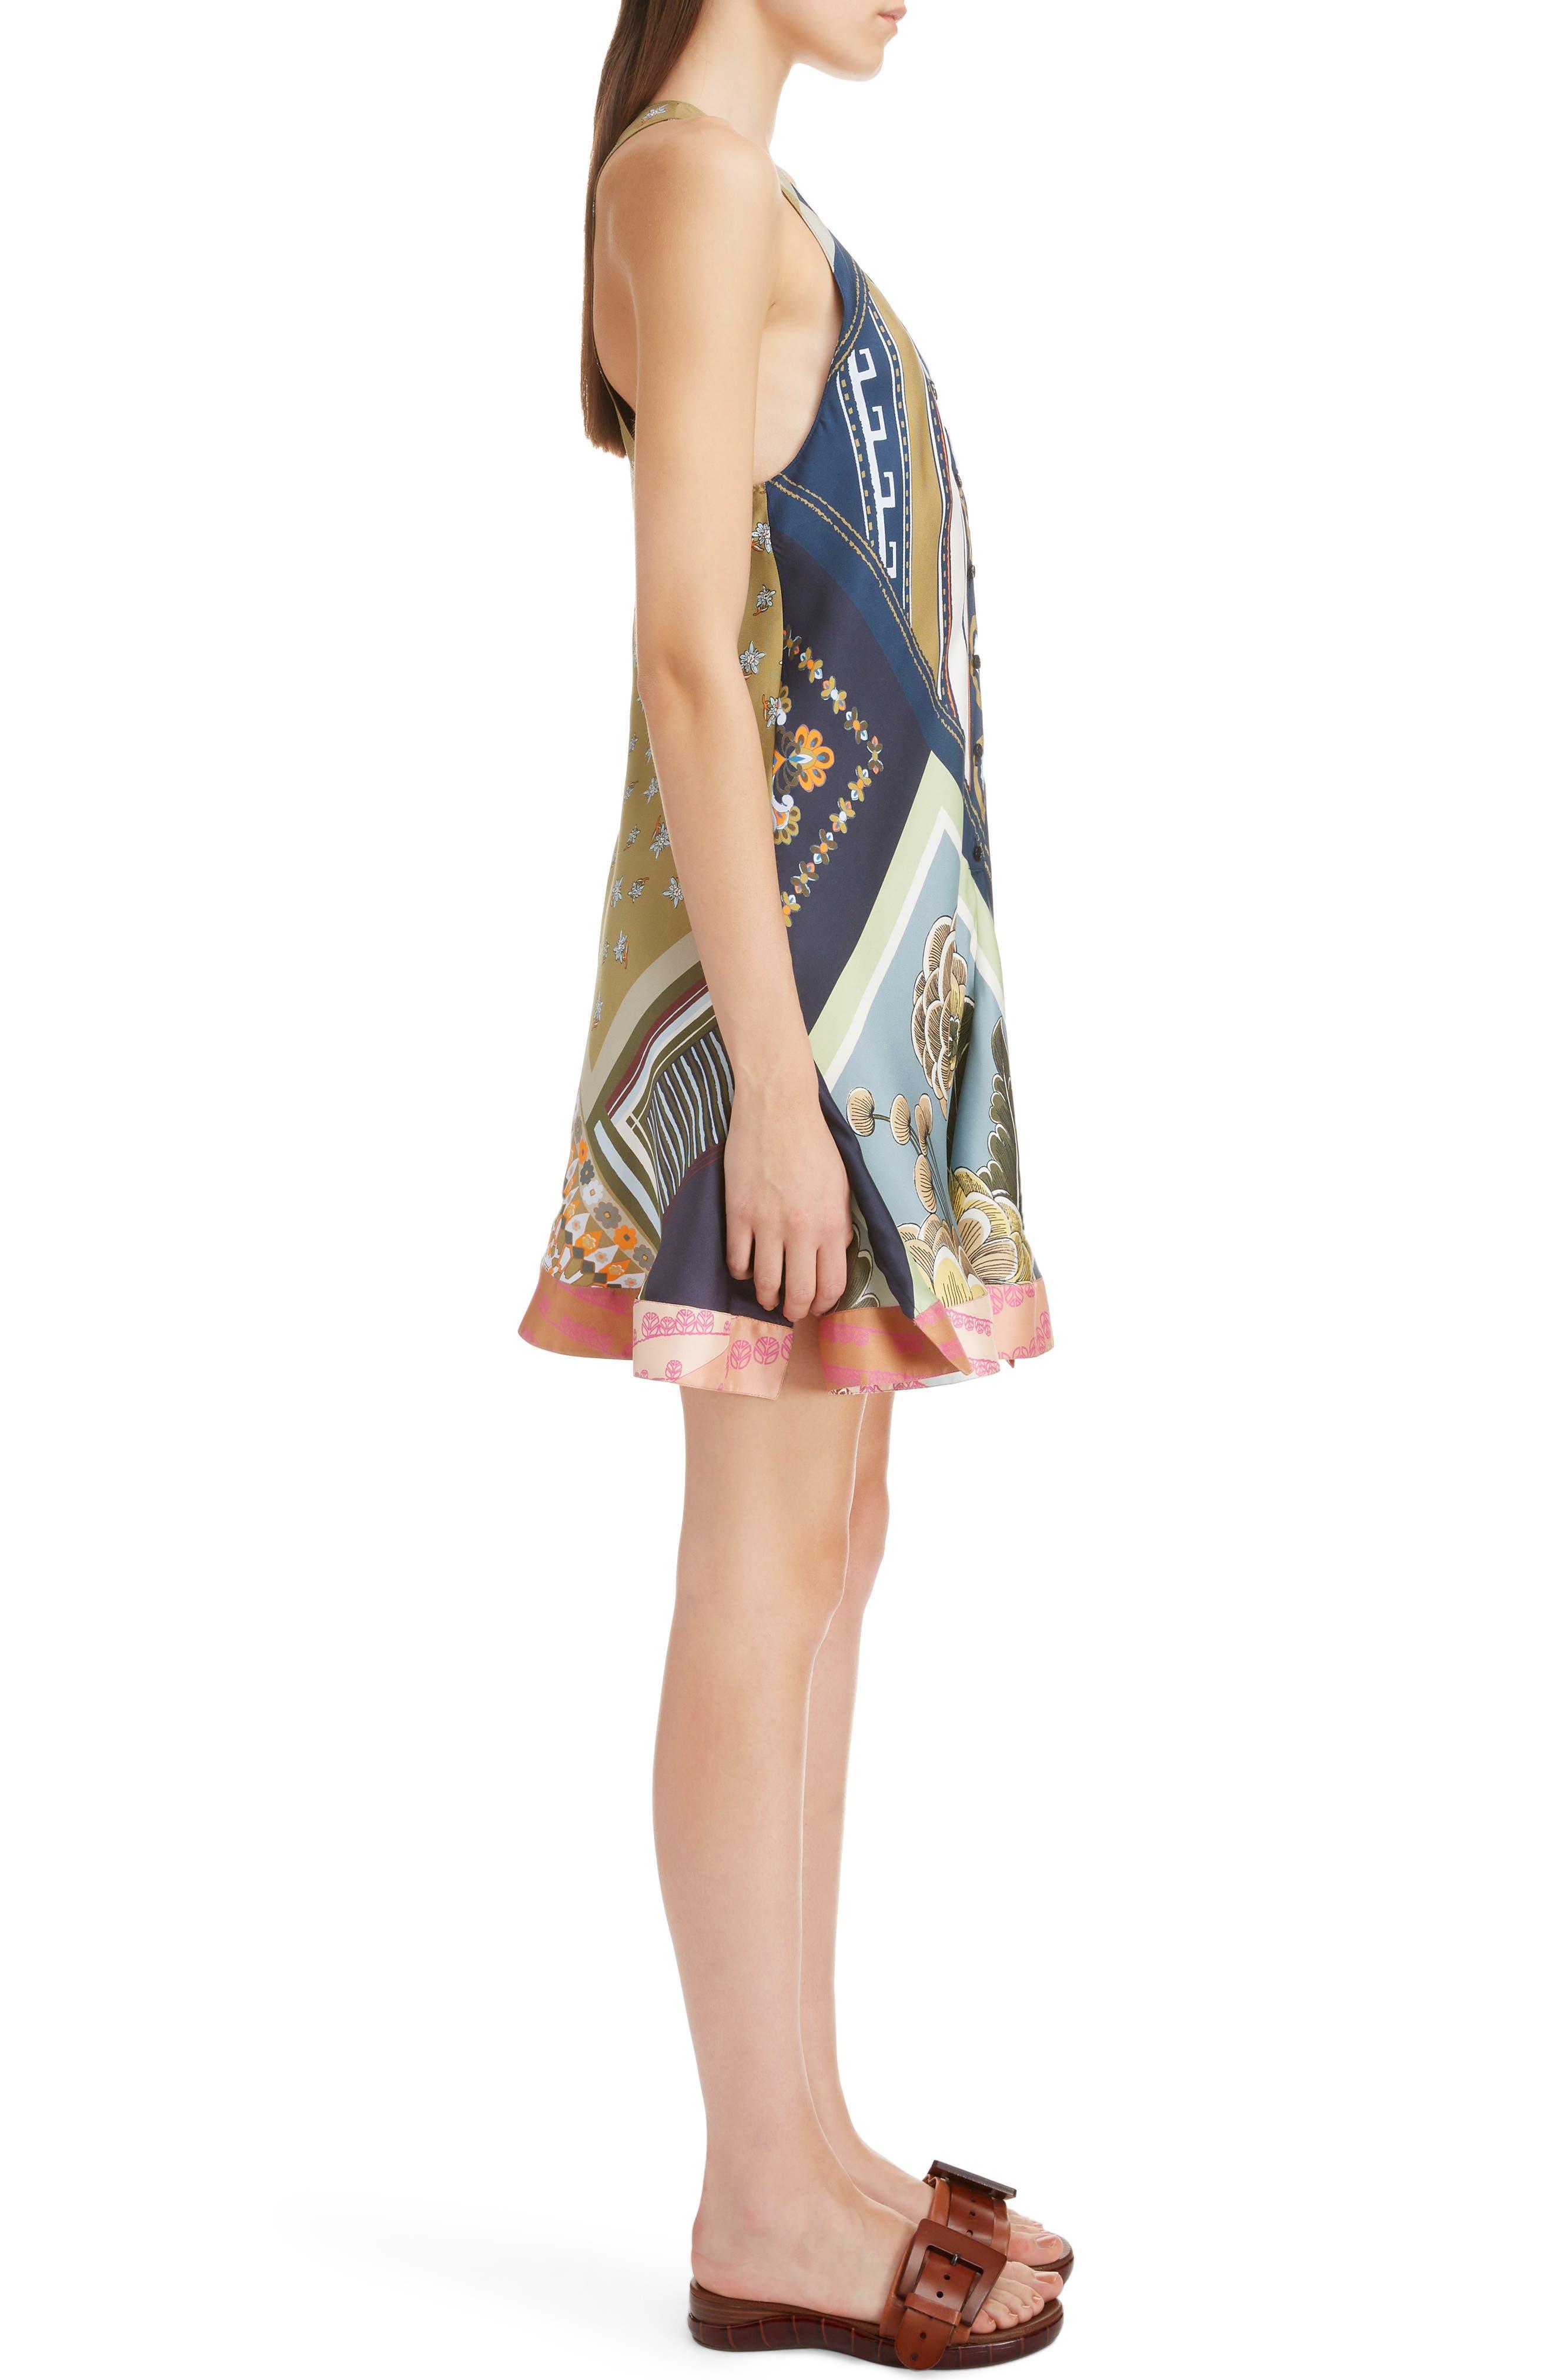 CHLOÉ,                             Caravan Print Silk Racerback Dress,                             Alternate thumbnail 3, color,                             MULTICOLOR BLUE